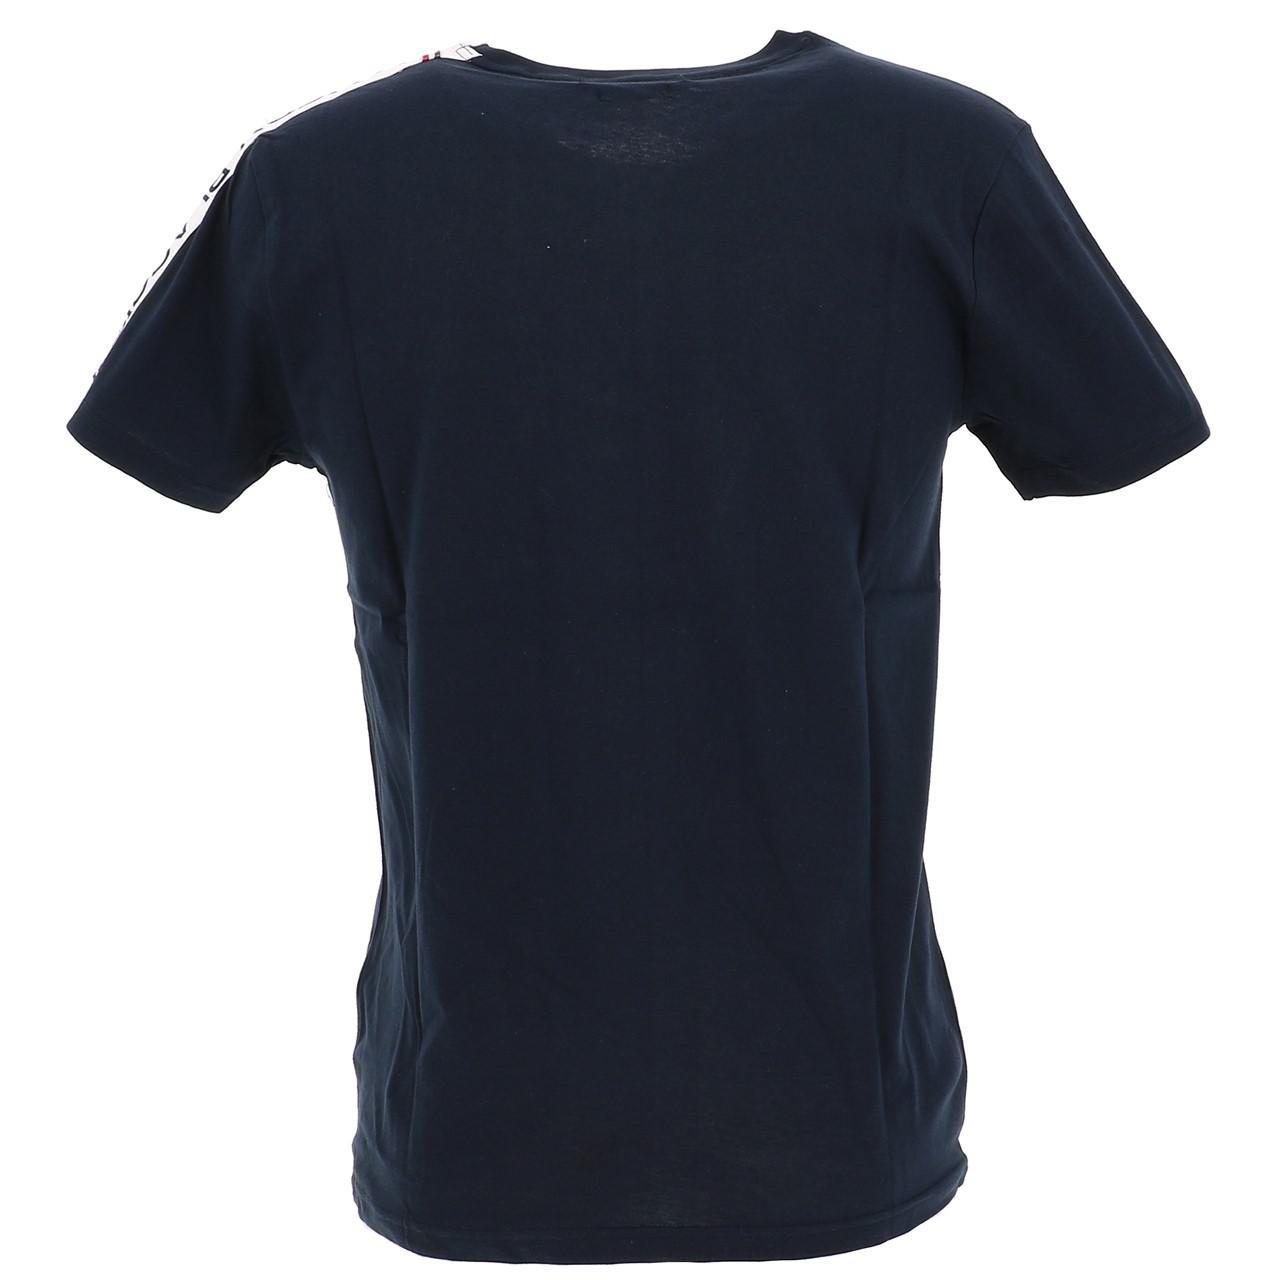 Short-Sleeve-T-Shirt-La-Maison-Blaggio-Metili-Navy-Mc-Tee-Blue-27343-New thumbnail 5